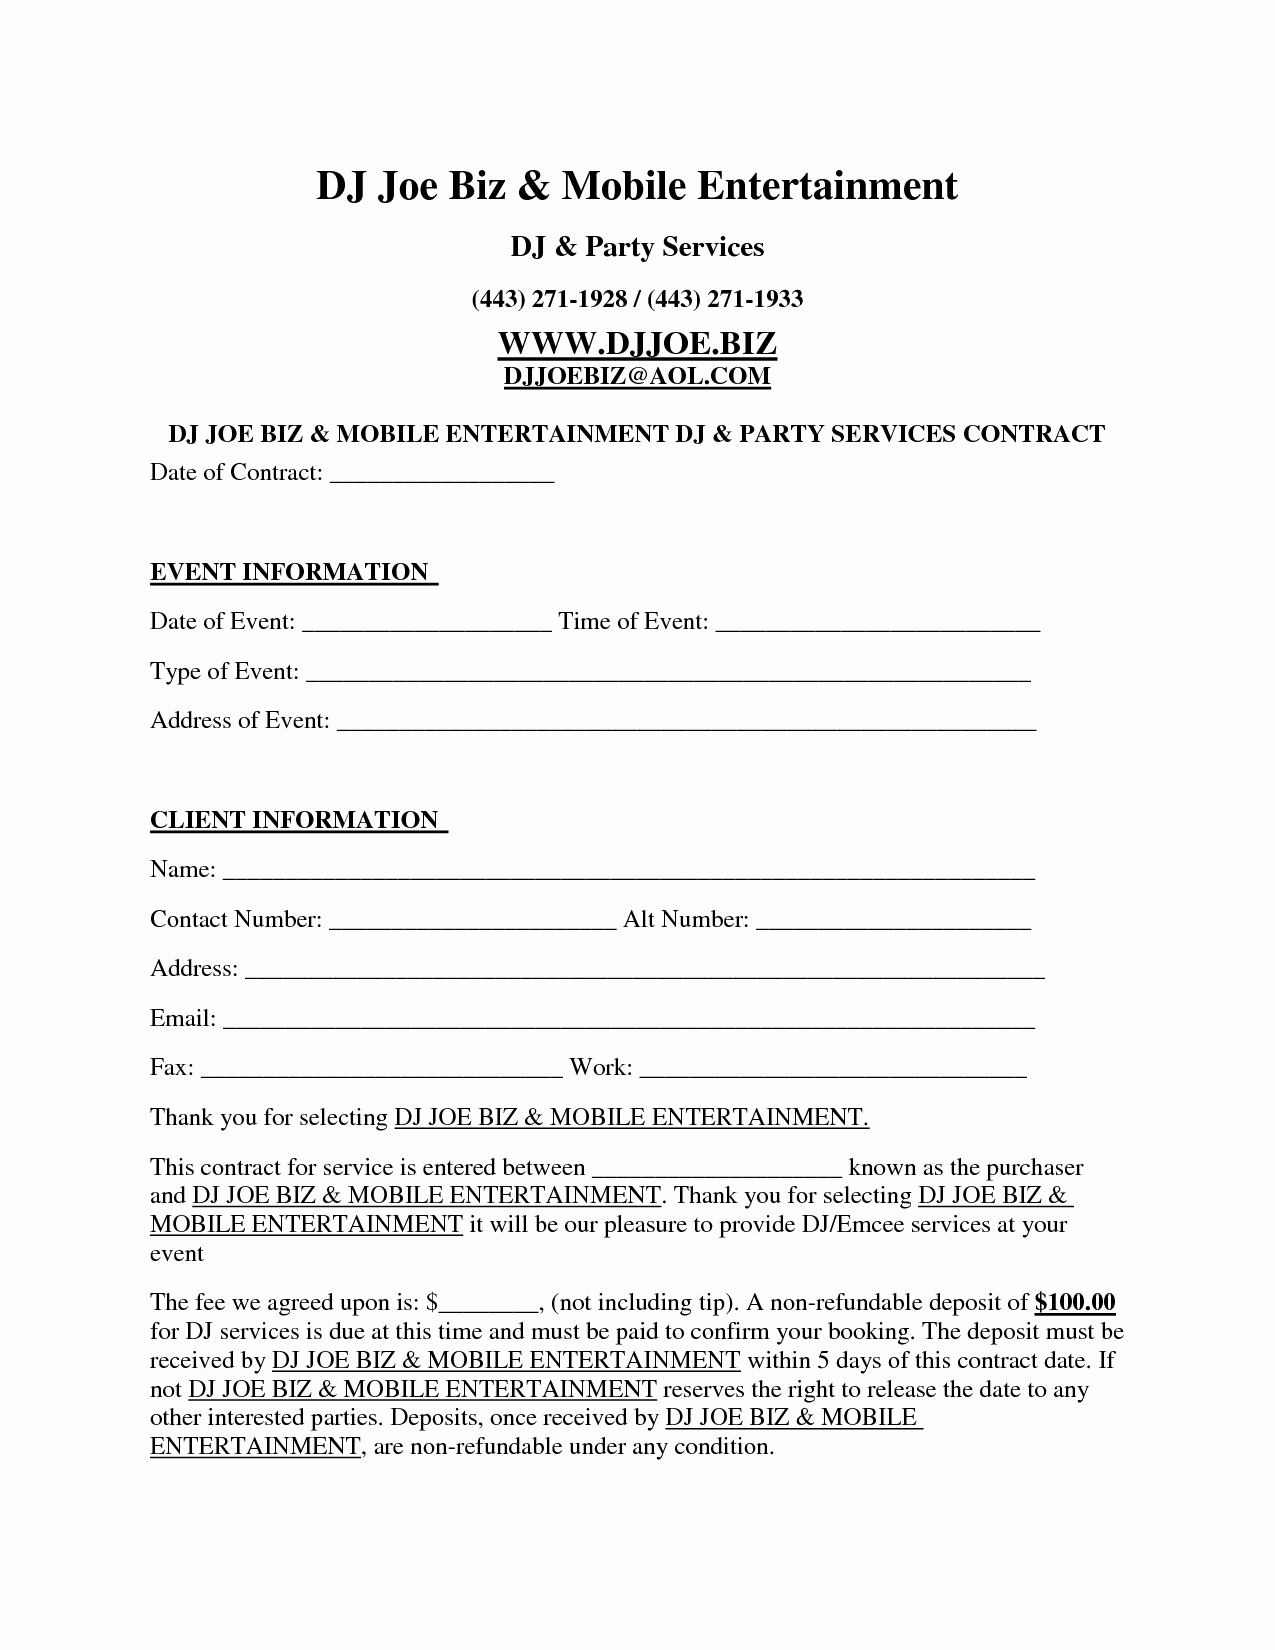 Wedding Flower Contract Template Elegant Dj Contract Free Printable Documents